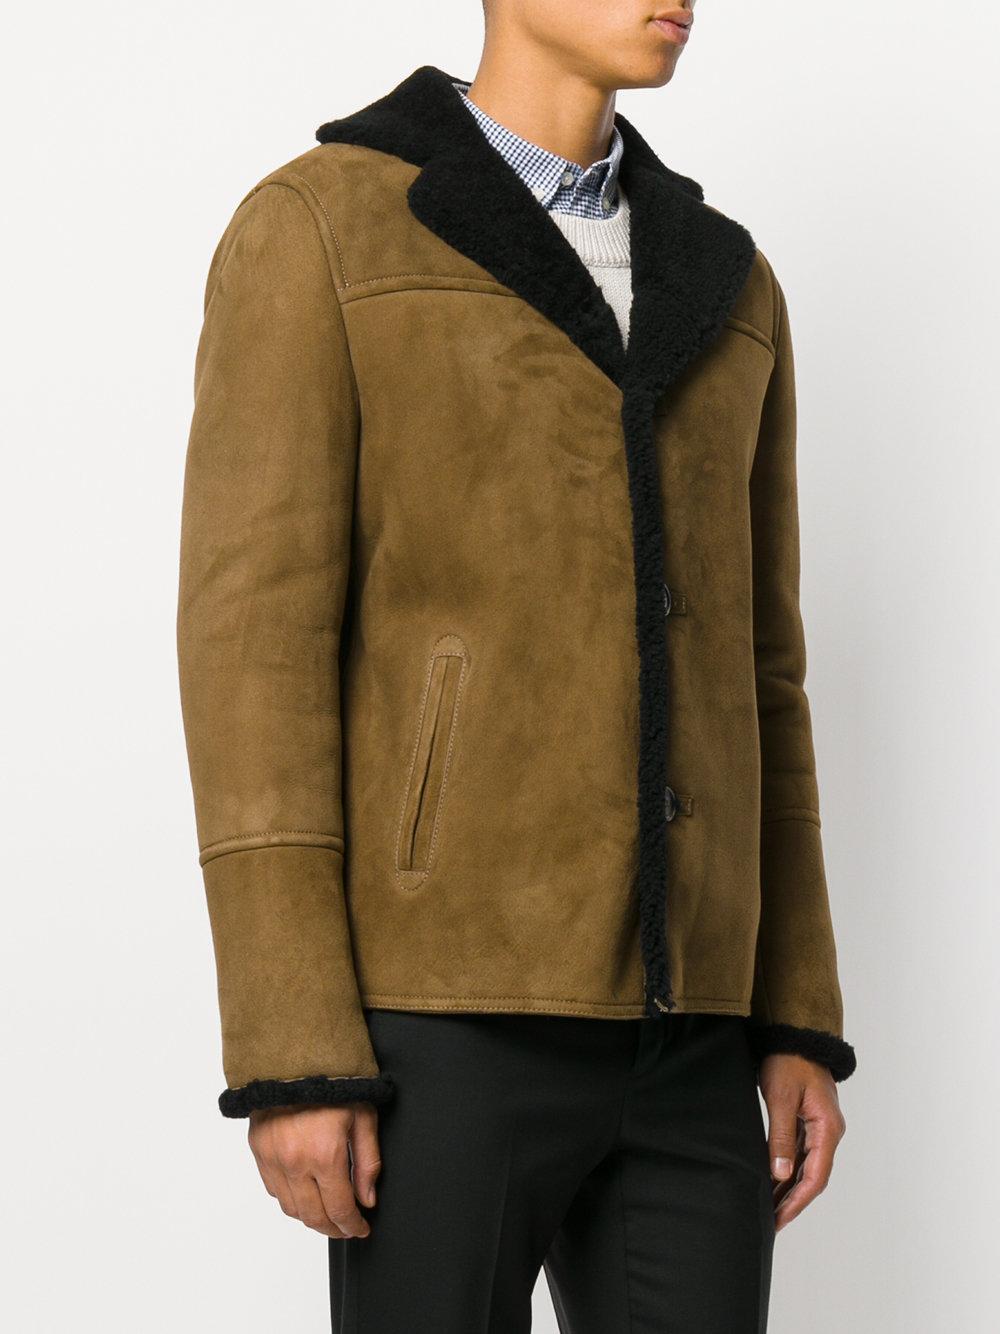 DESA NINETEENSEVENTYTWO Buttoned Jacket for Men